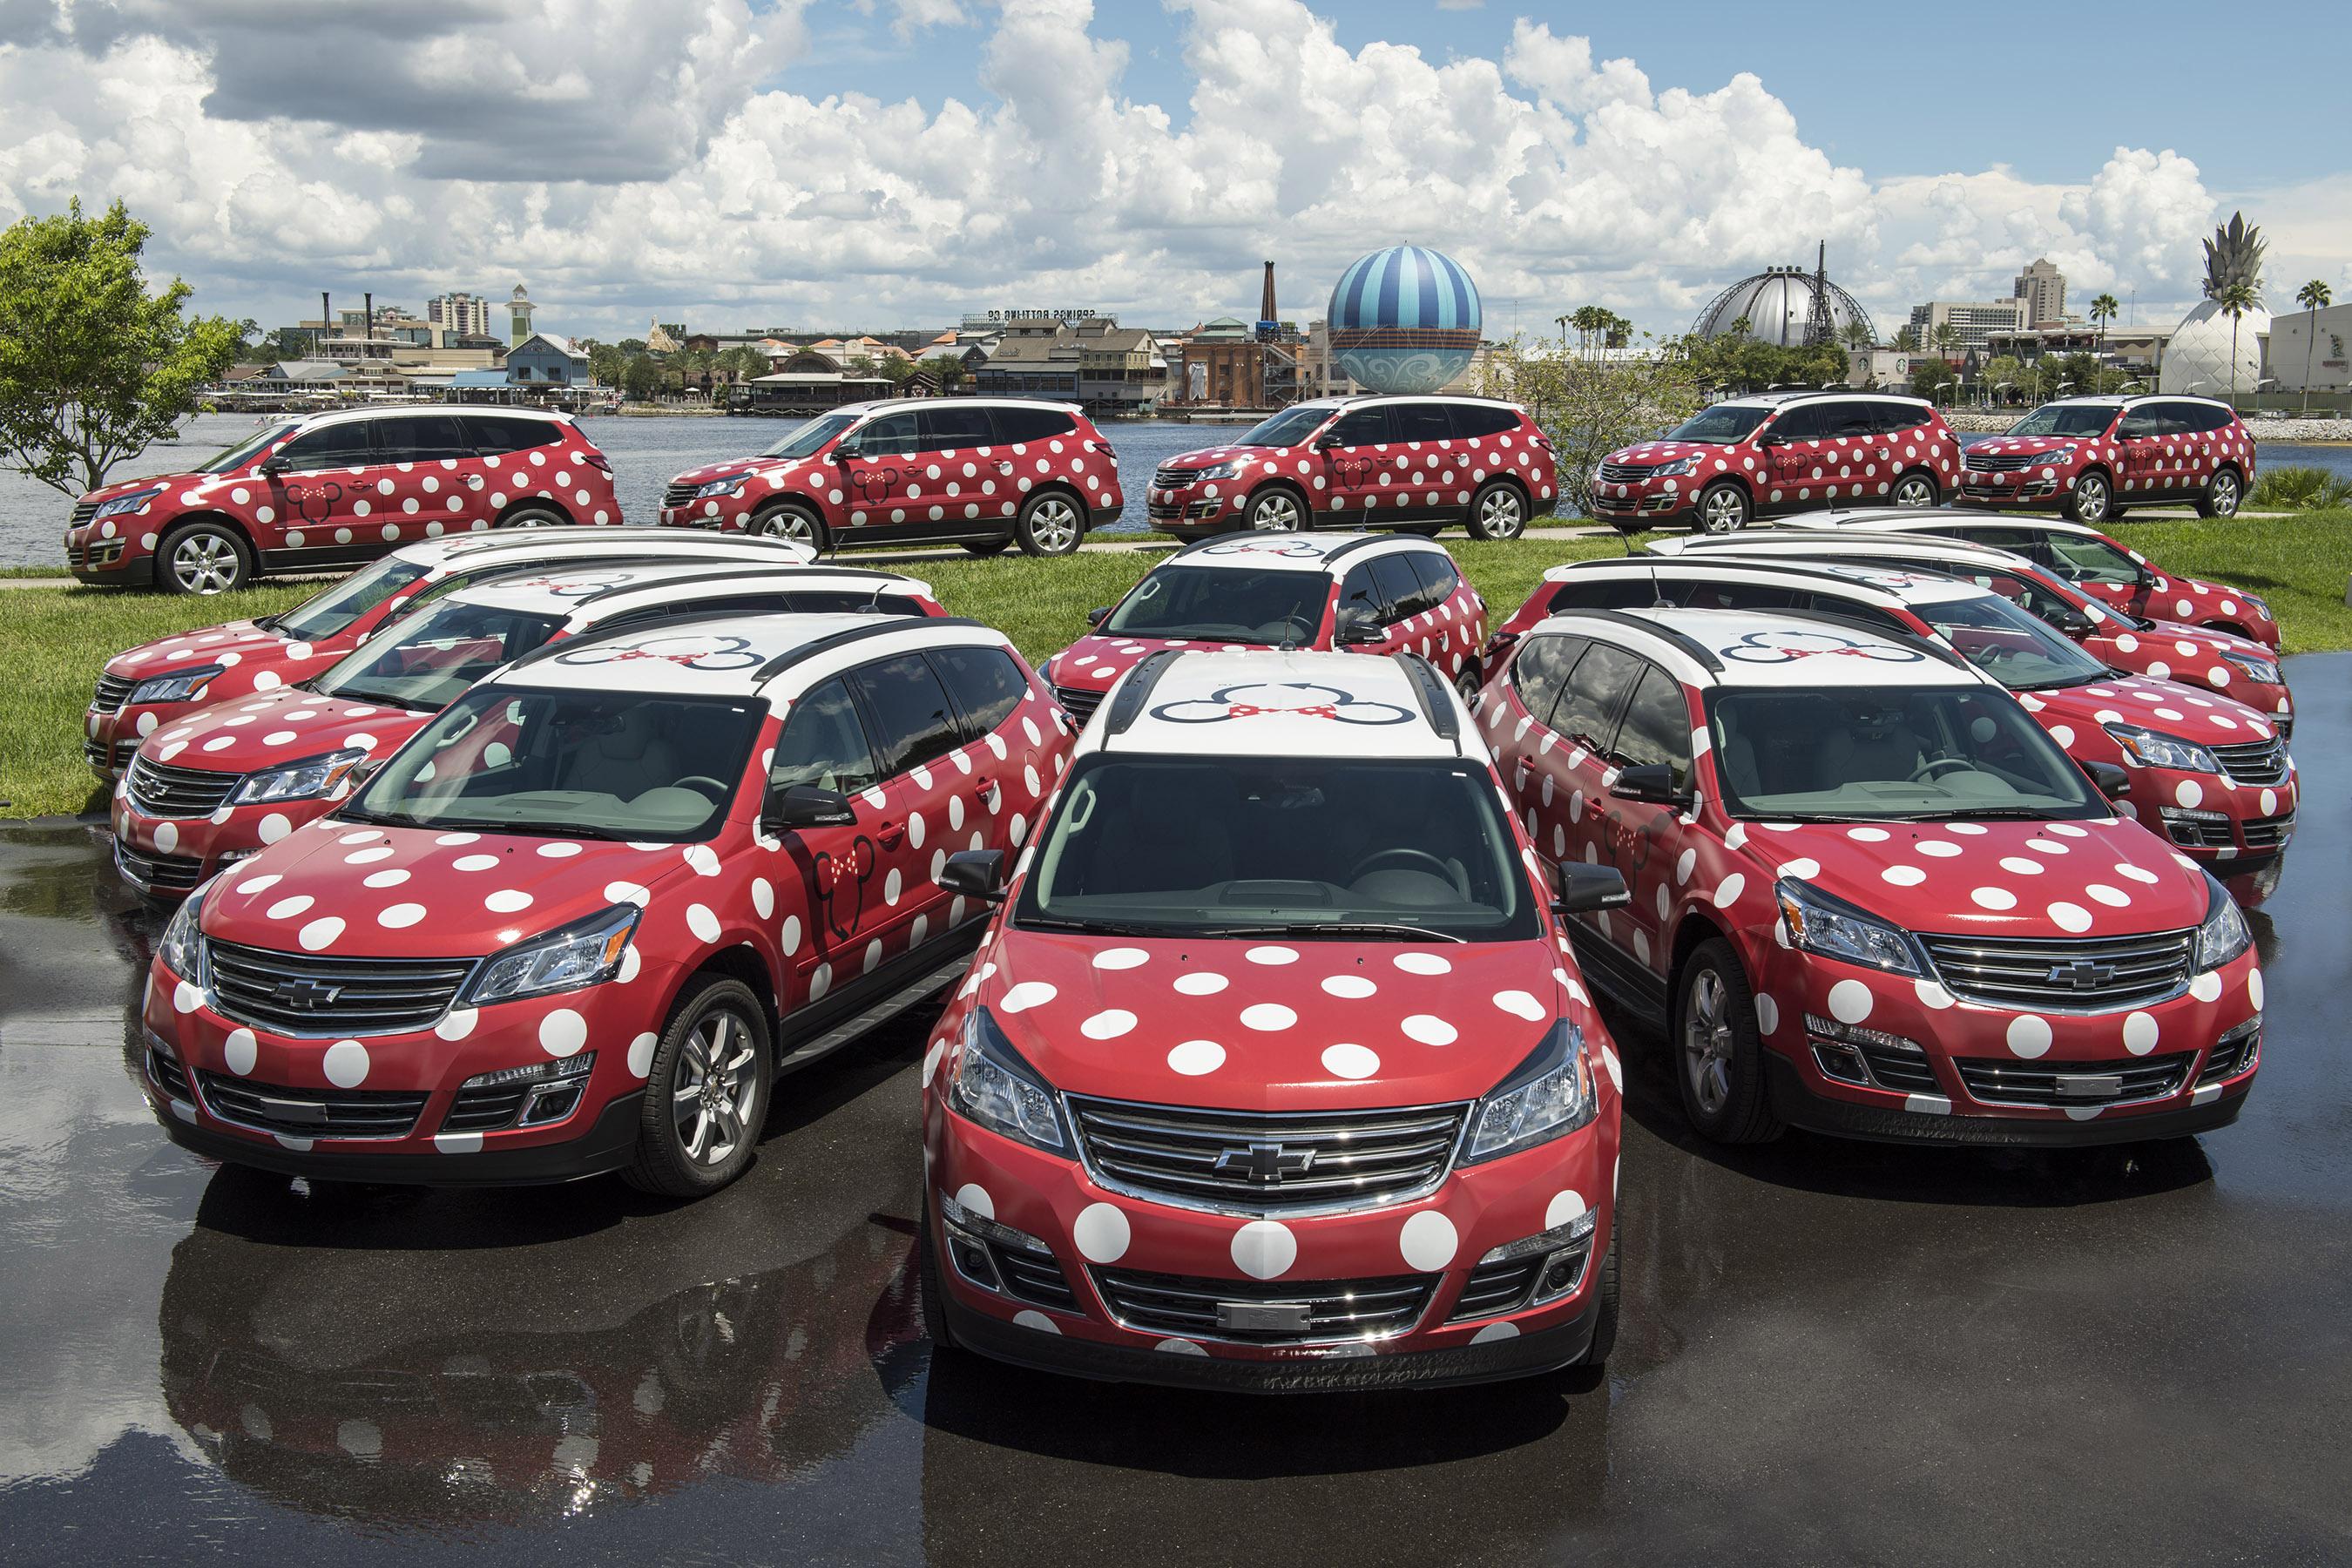 Lyft and Disney launch 'Minnie Van' on